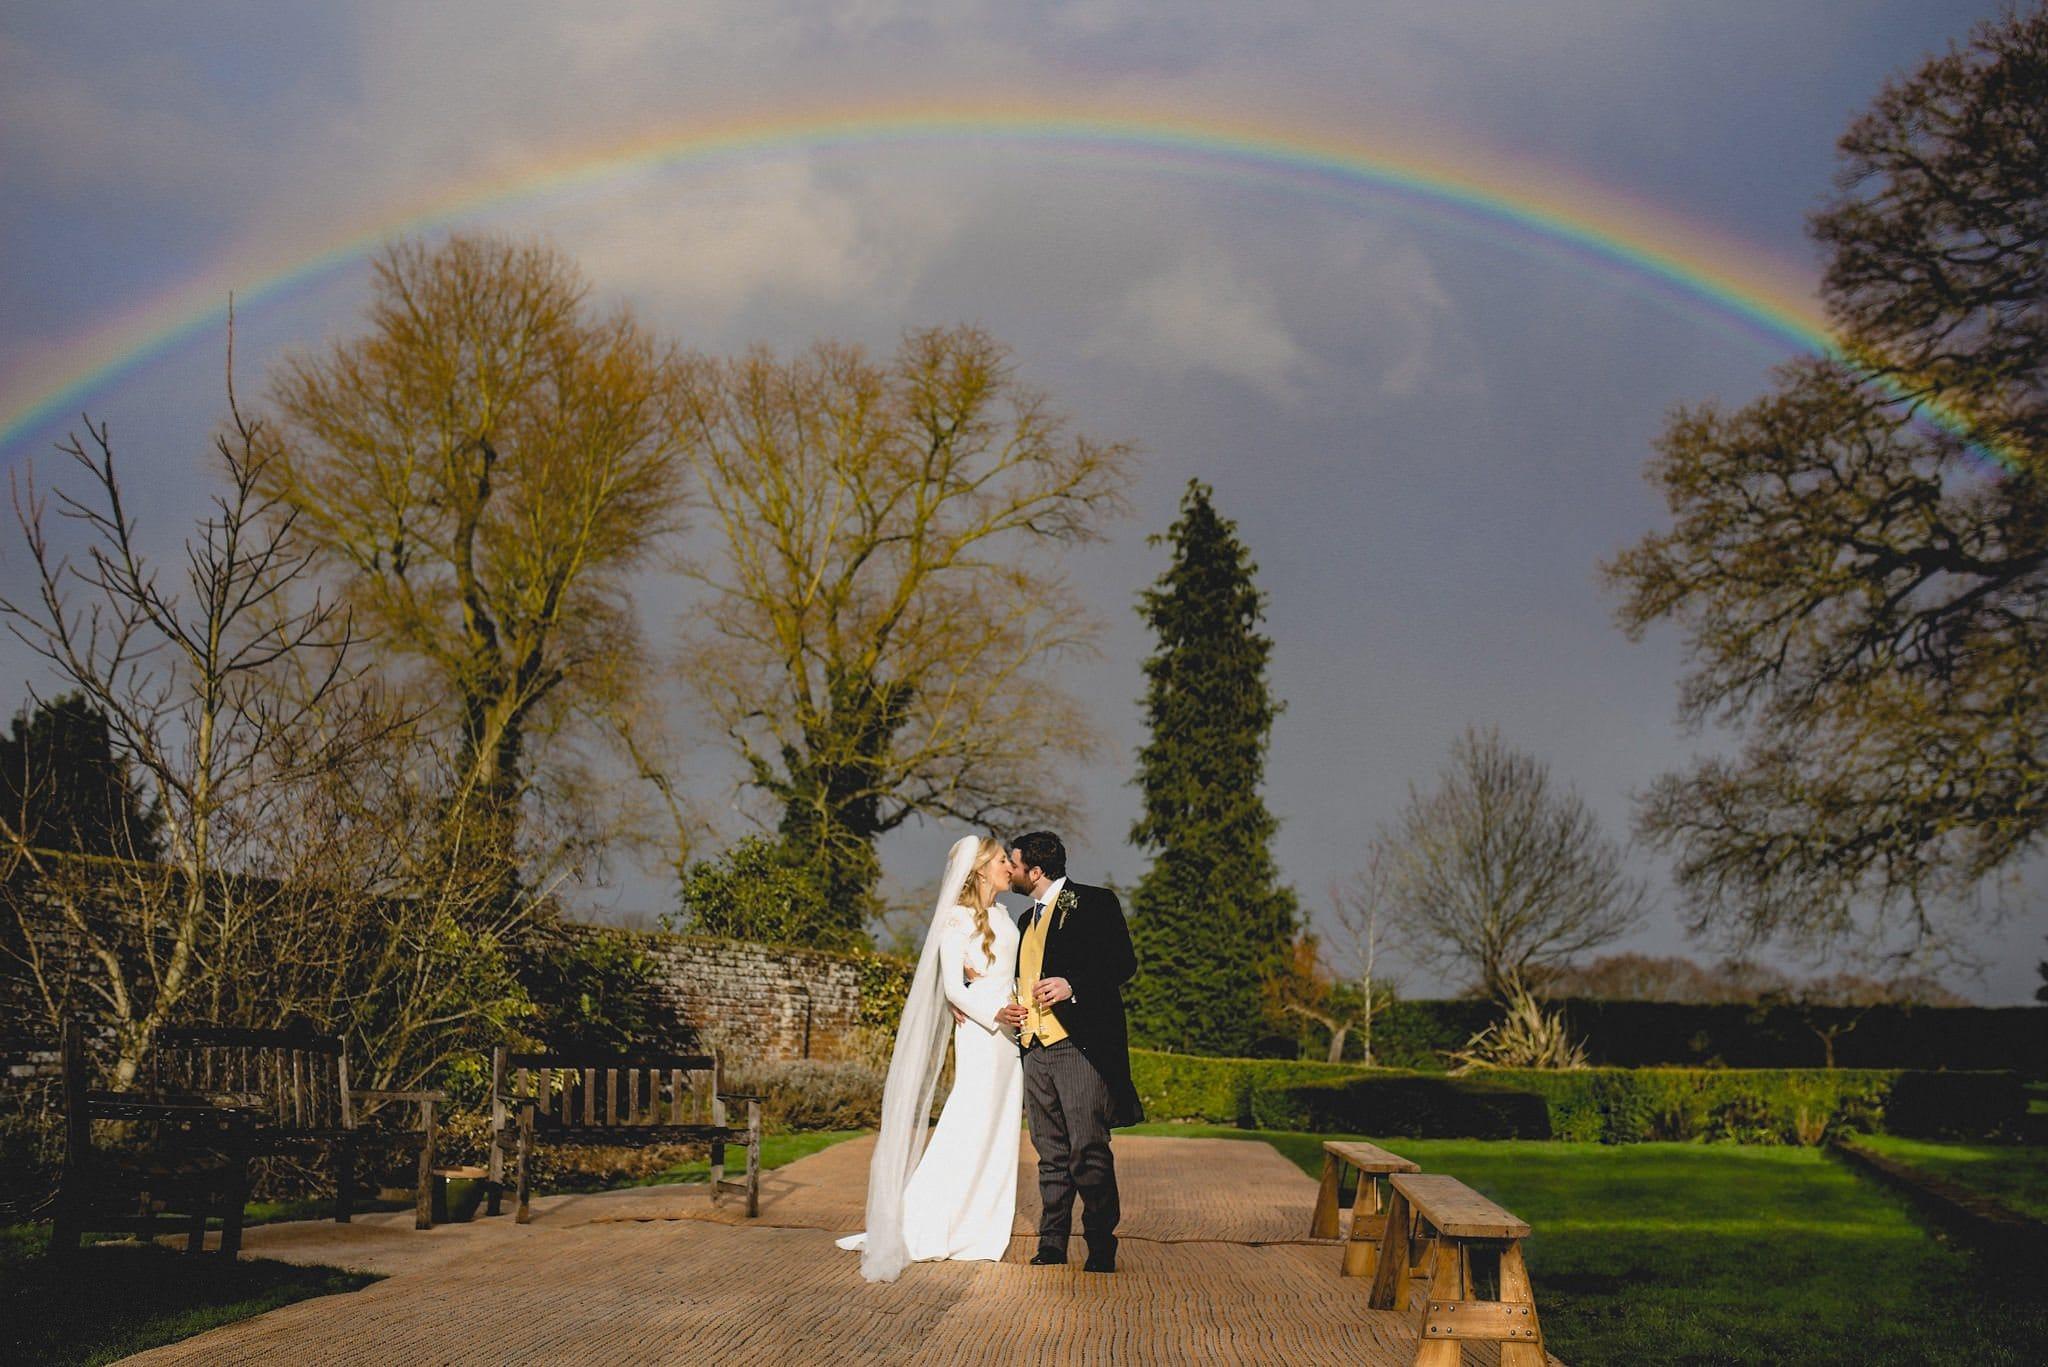 Bride and groom kiss with a rainbow overhead